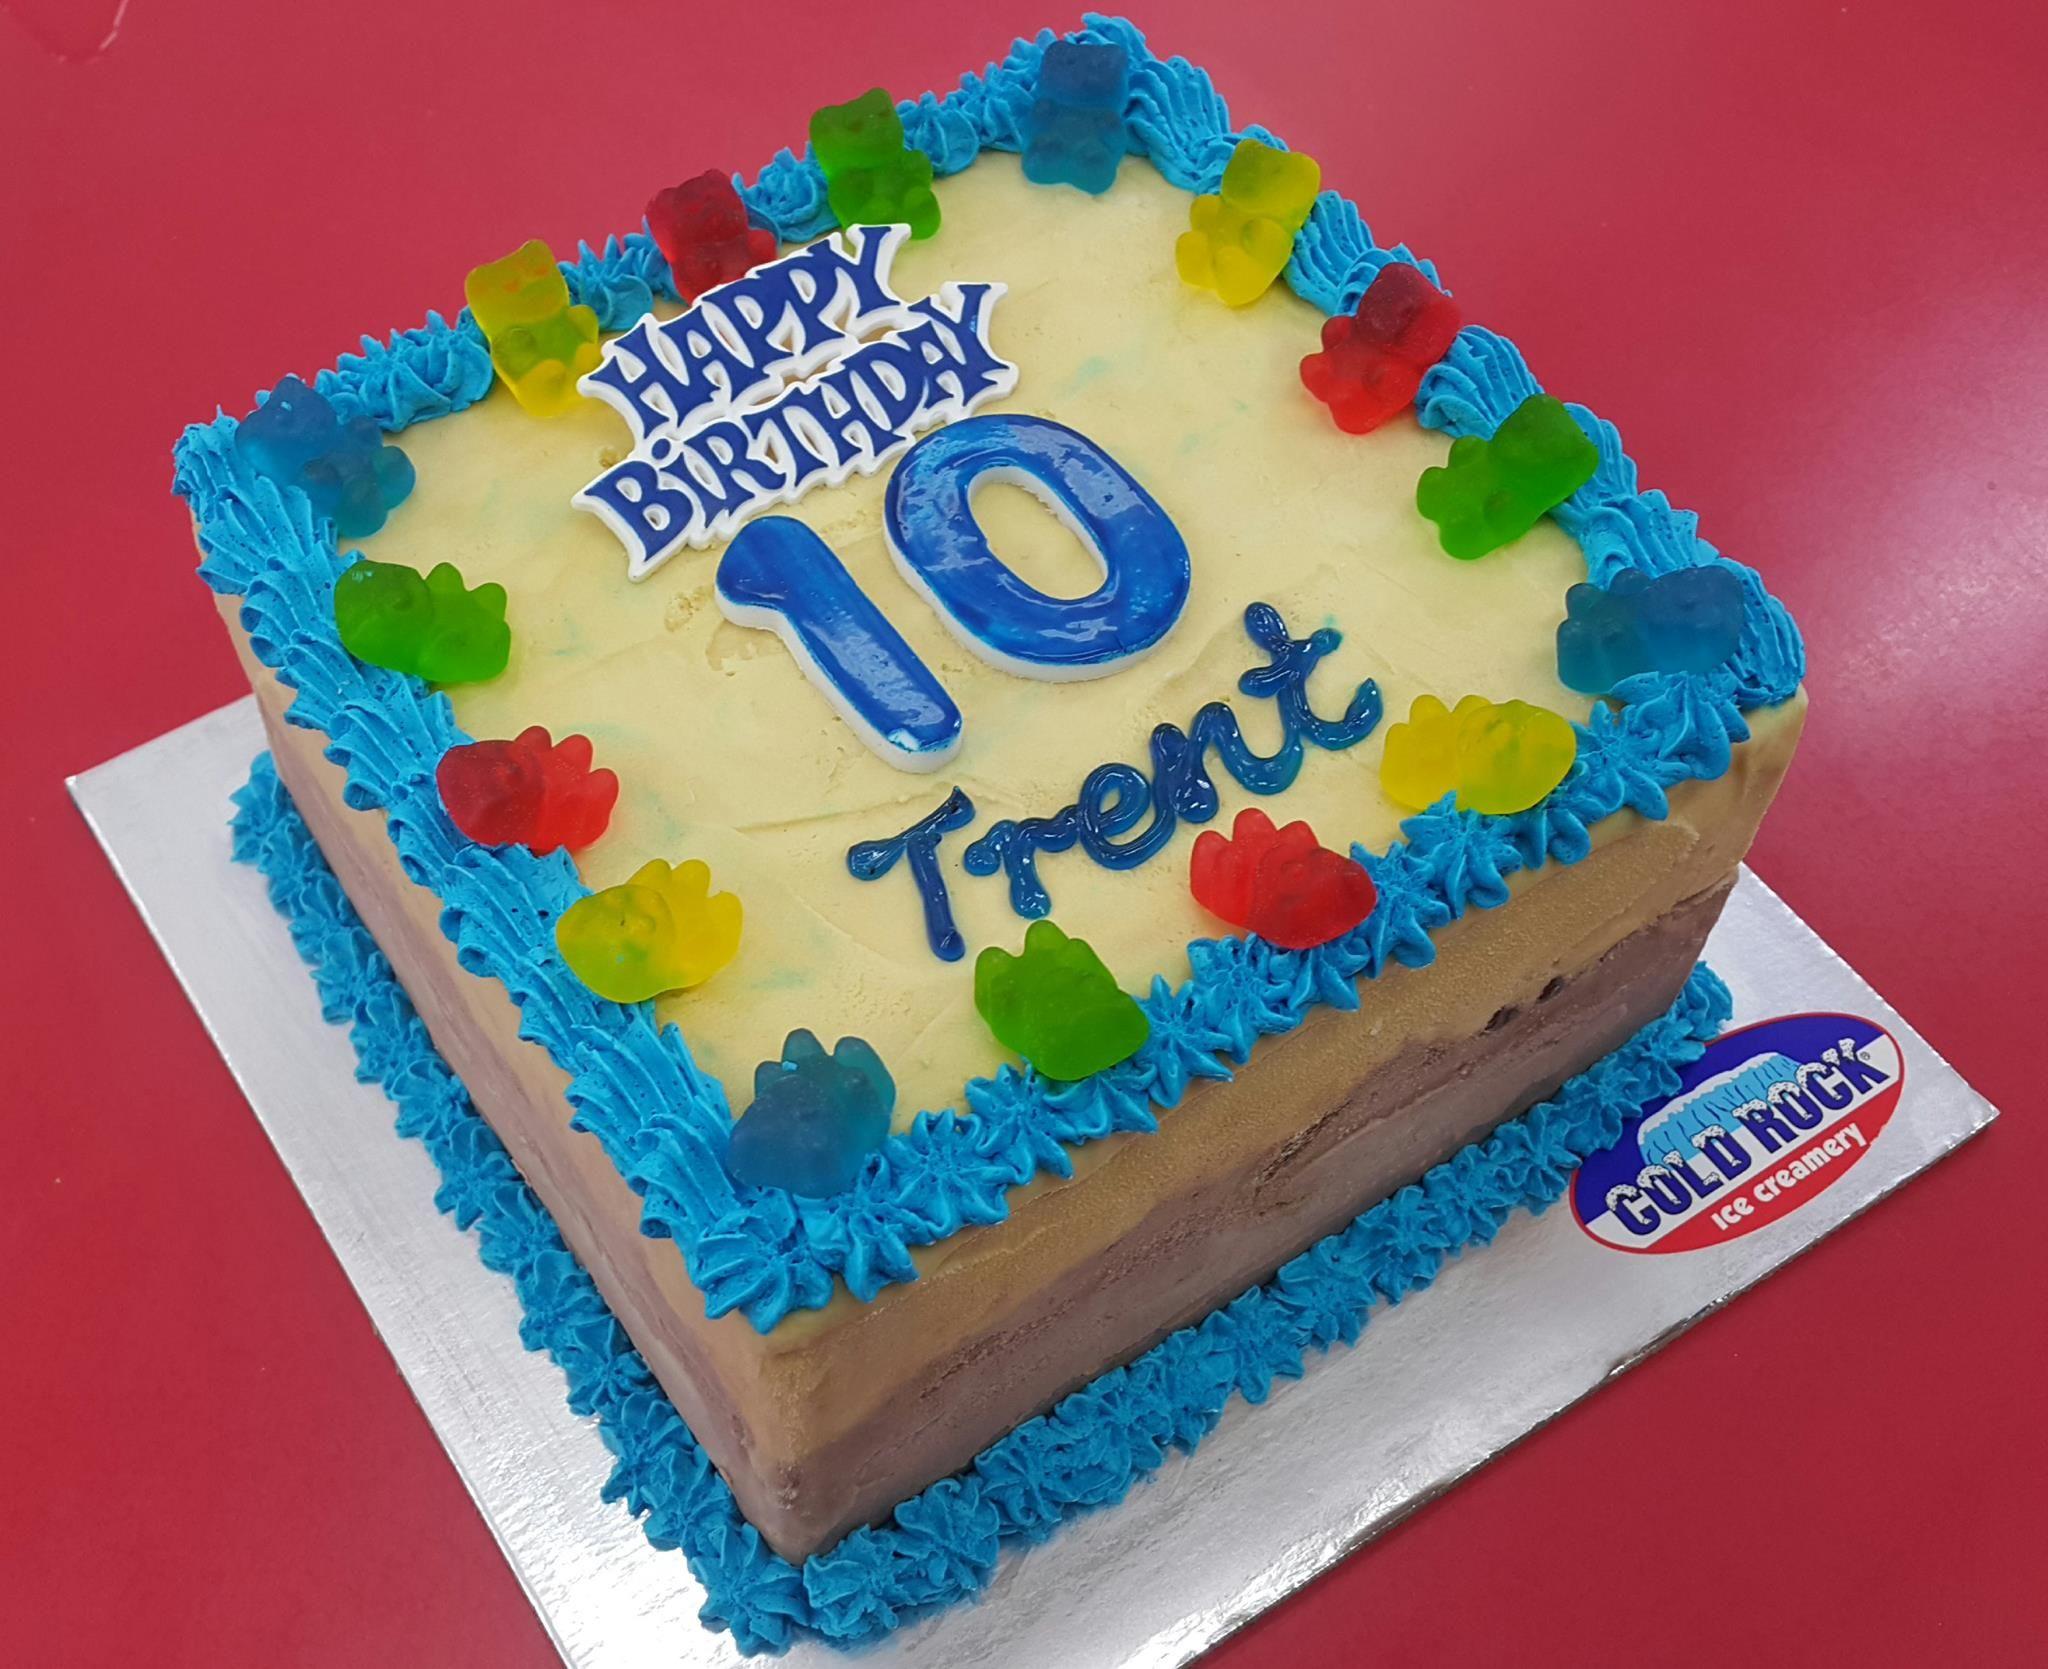 Cold Rock Ice Cream Birthday Cake Made Fresh In Store In Celebration